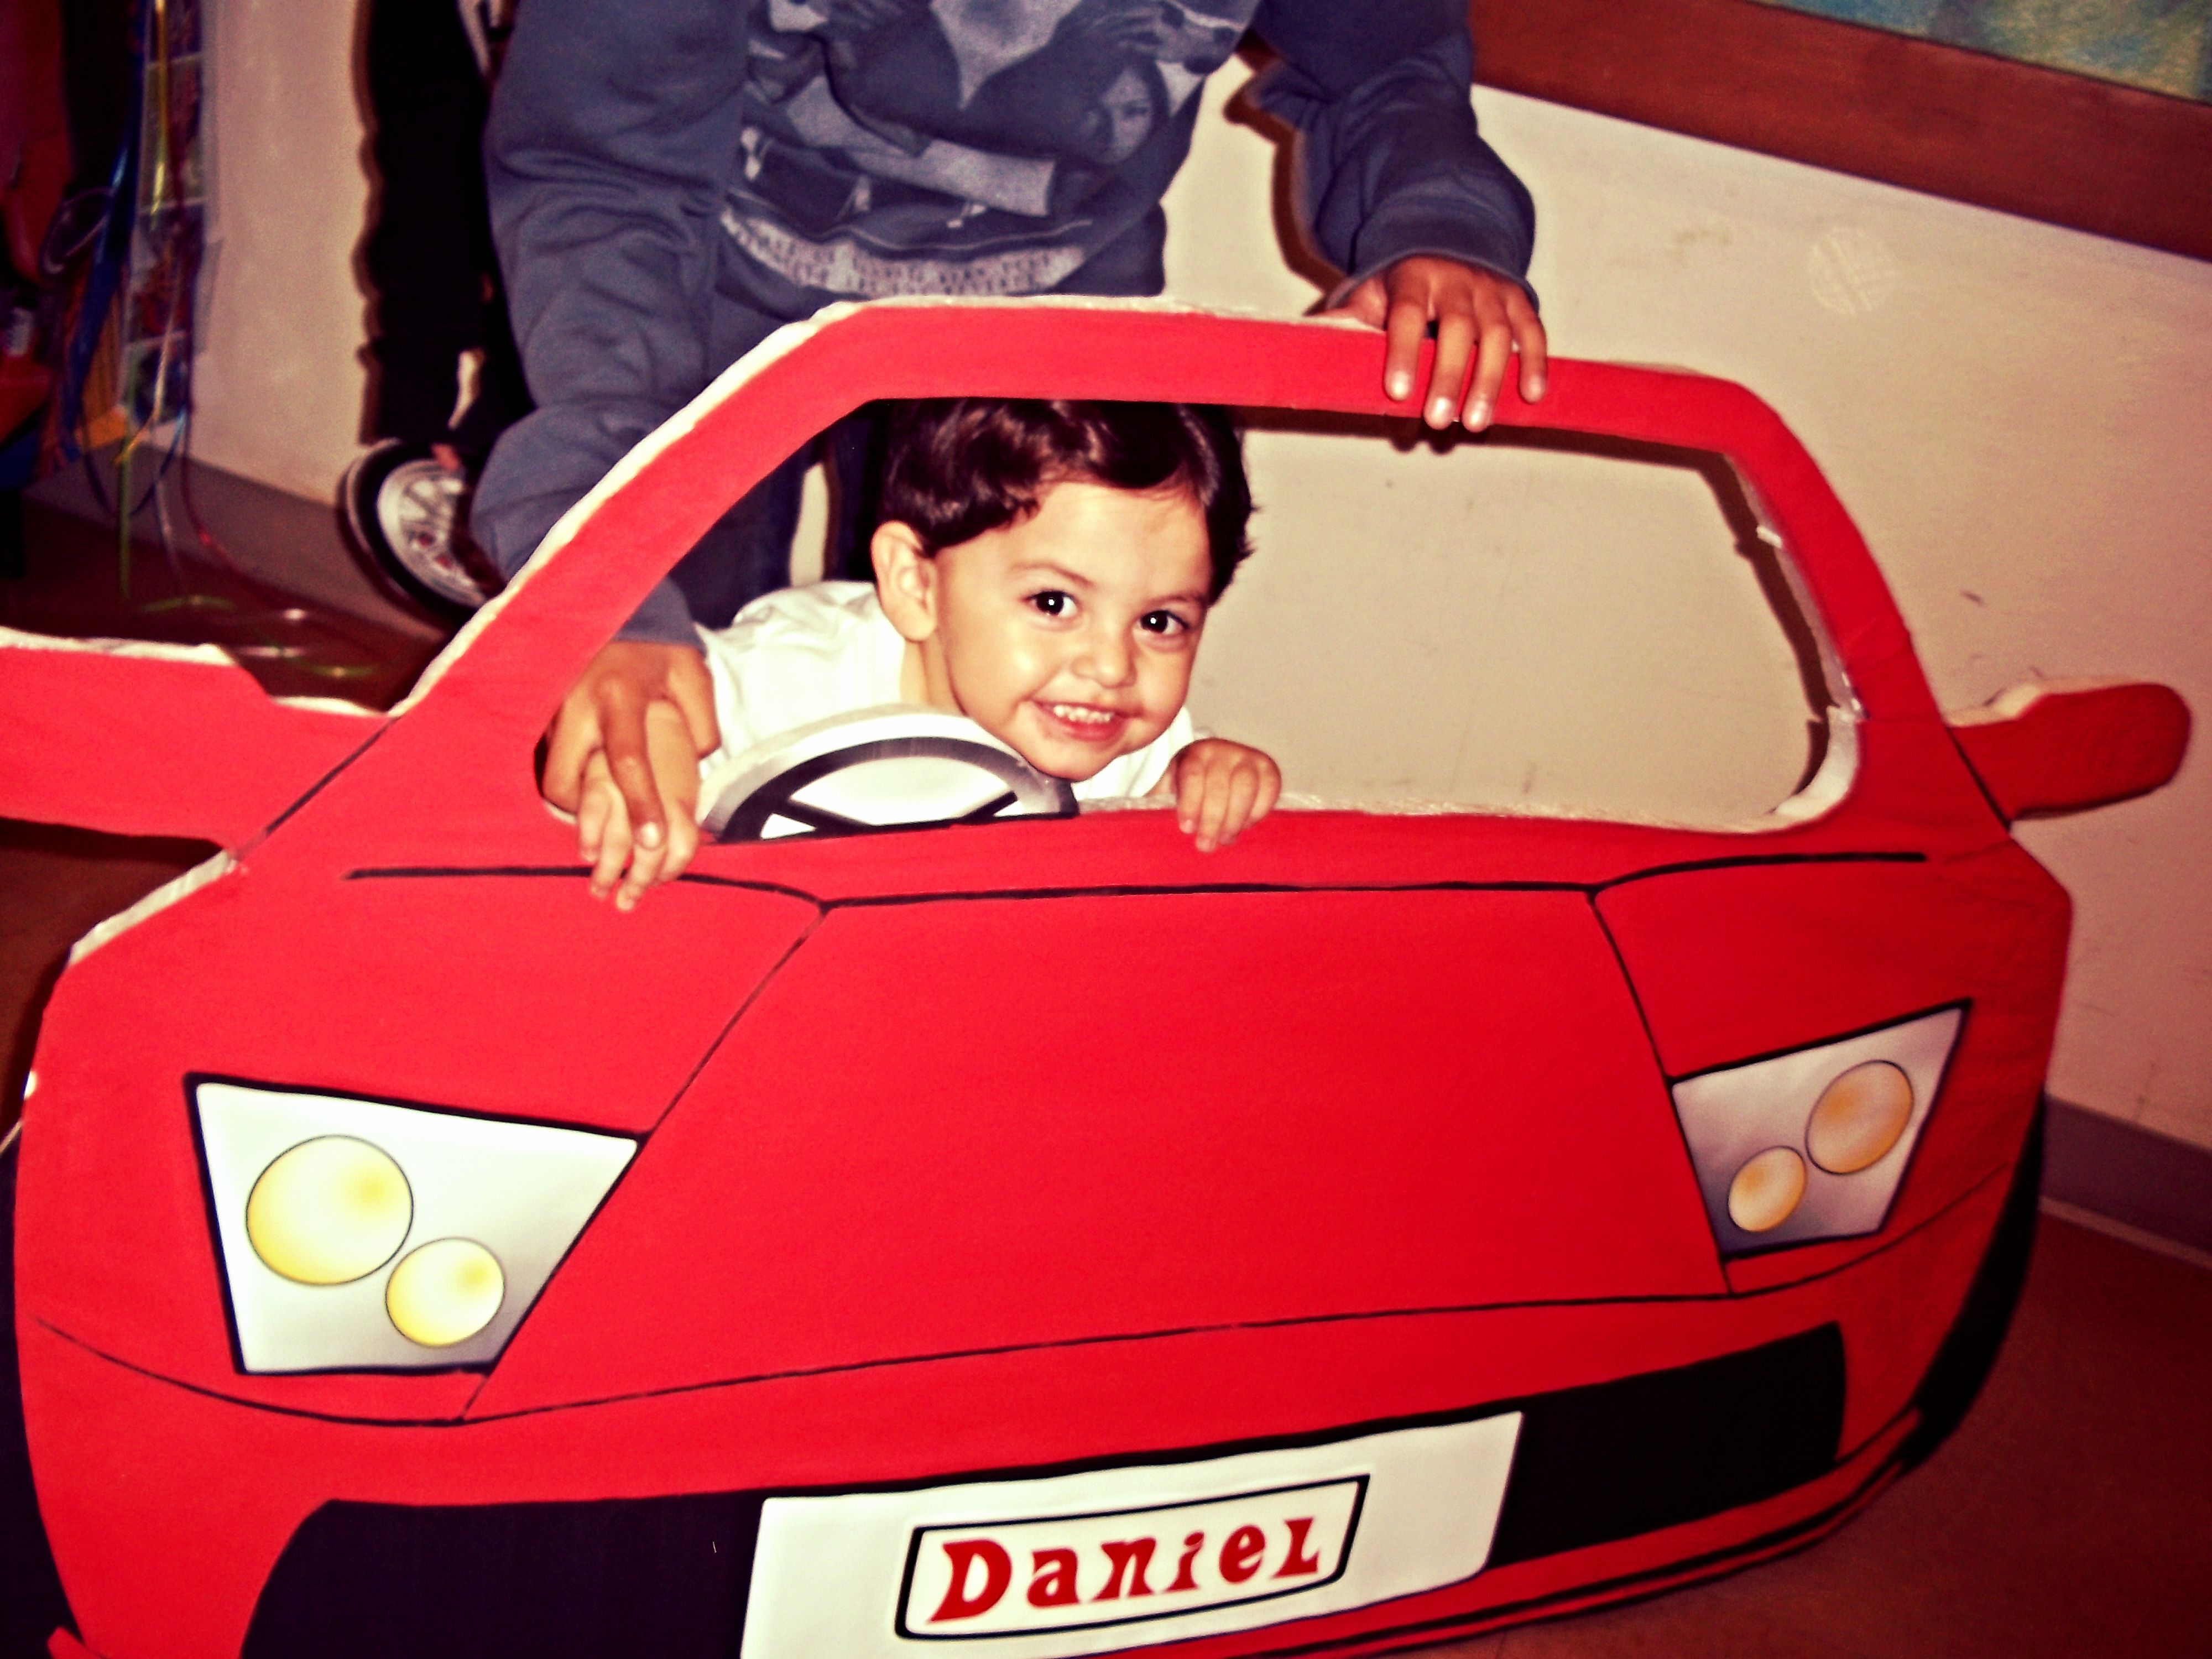 Danielus lamborghini car photo prop i ordered on etsy for u i